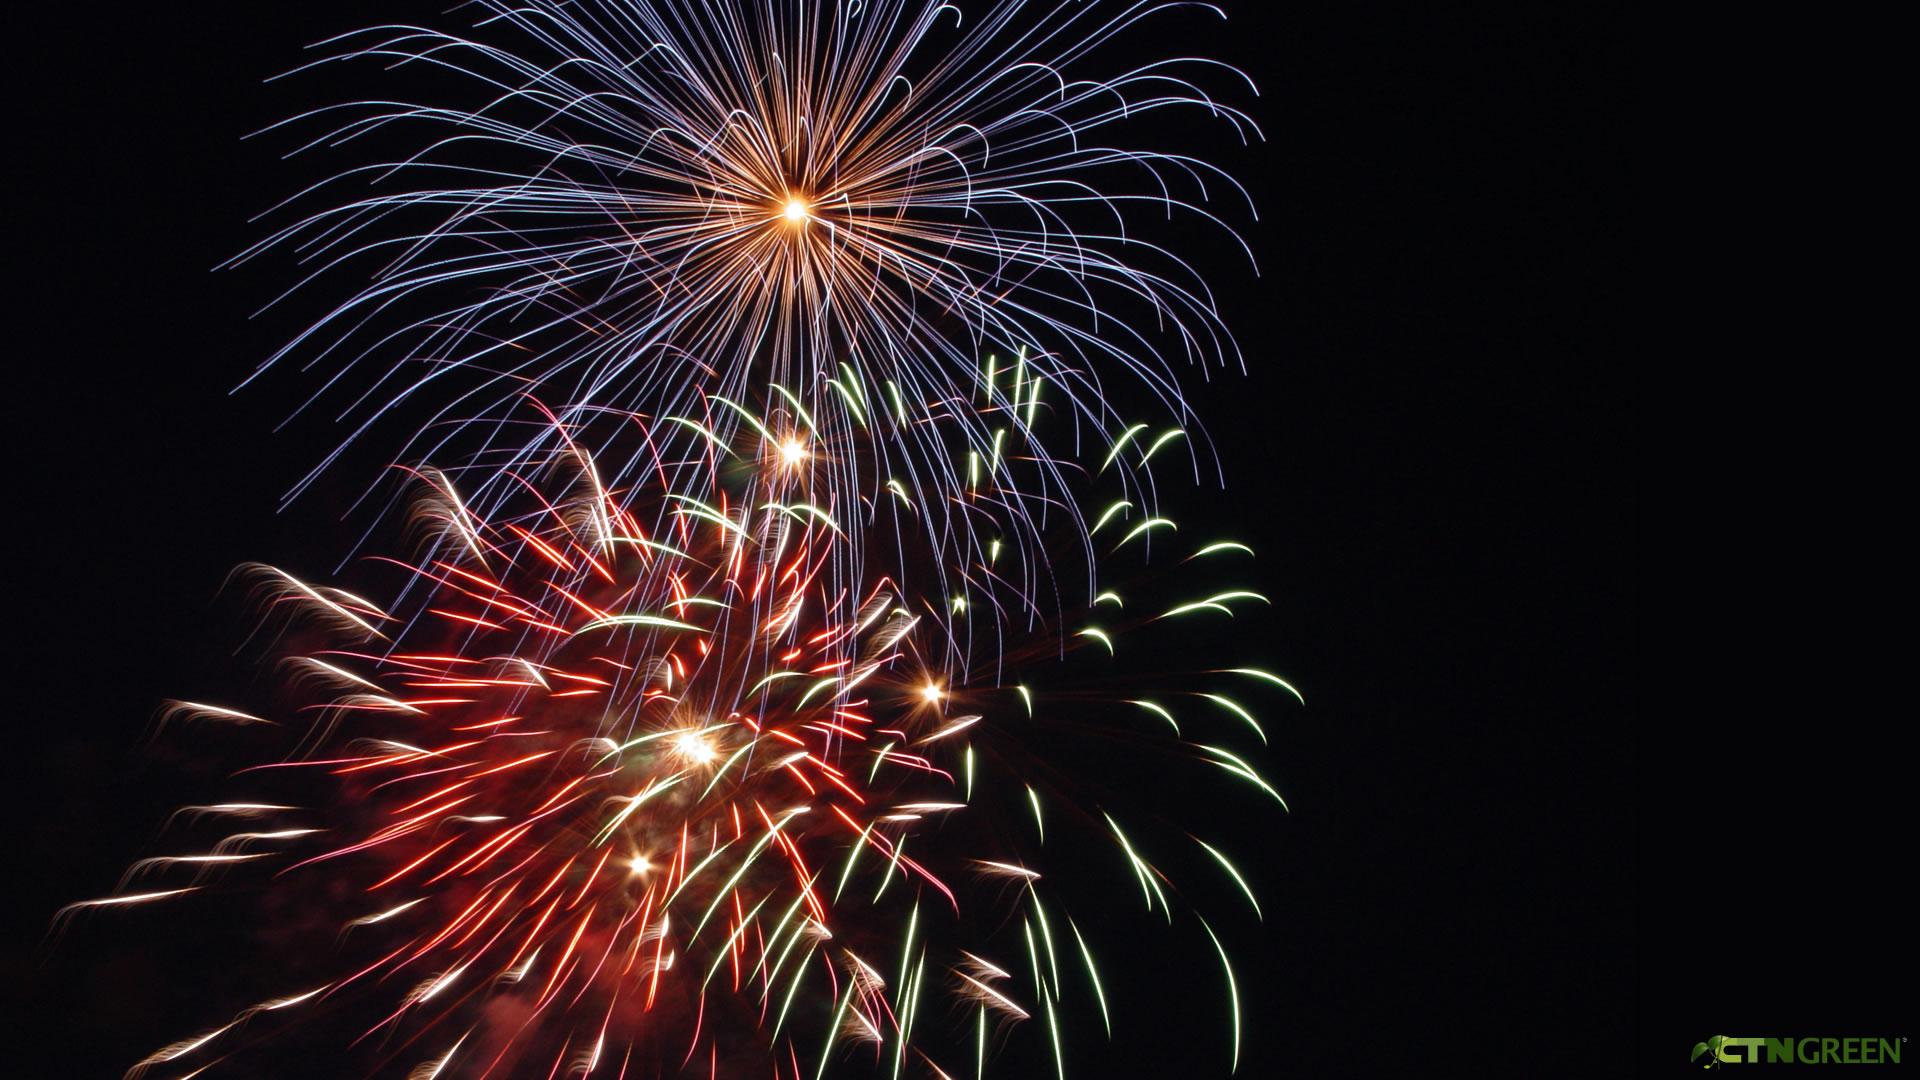 Fireworks Wallpaper Free: Firework Wallpaper